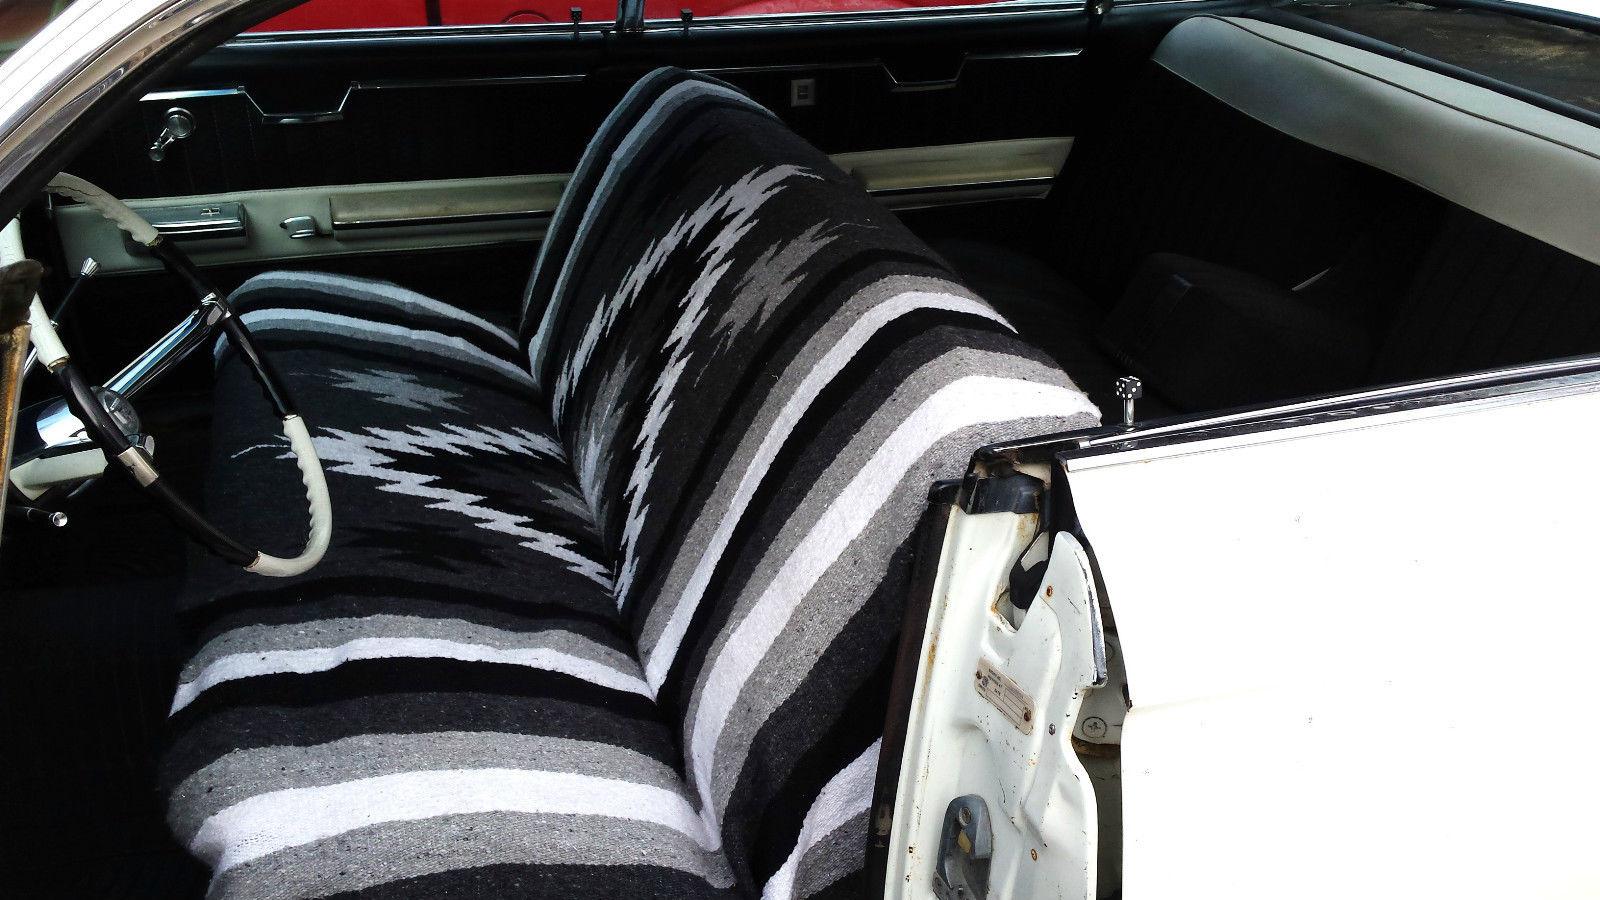 1962 Cadillac DeVille Series 62 w/ 5.3 LS Engine 4L60E 6 ...